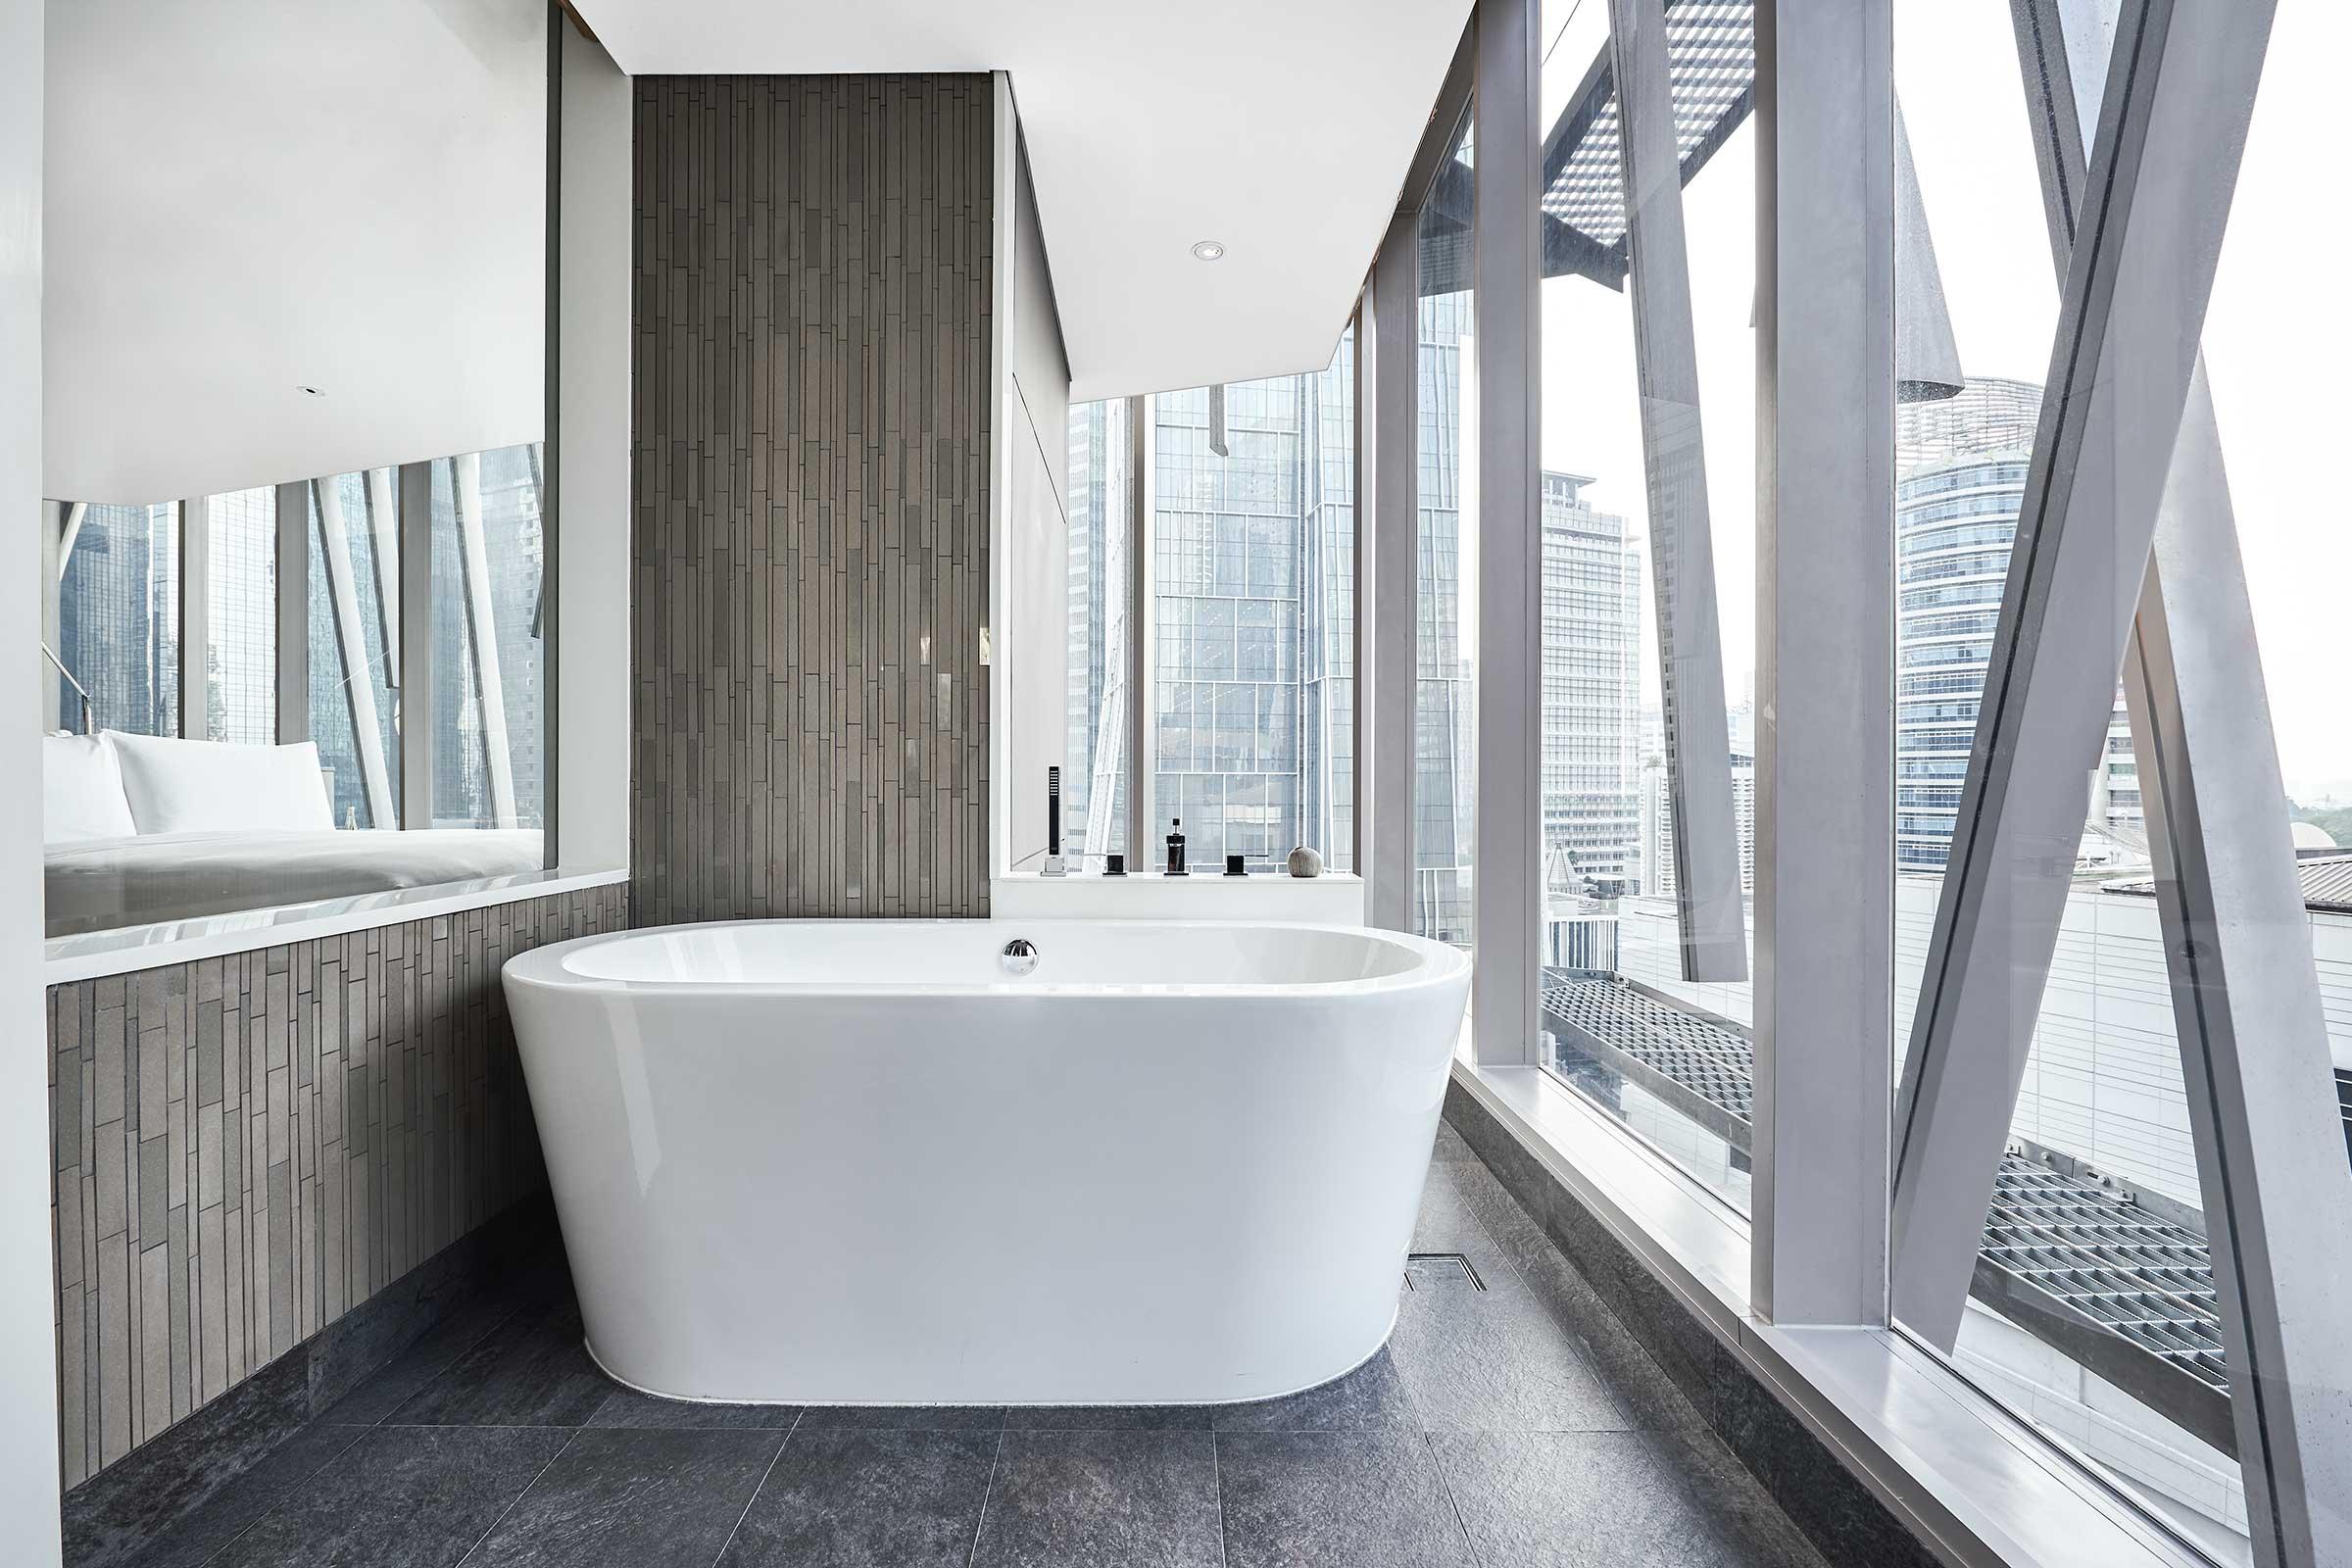 AJS---Accommodation---XL-King---Bathtub.jpg